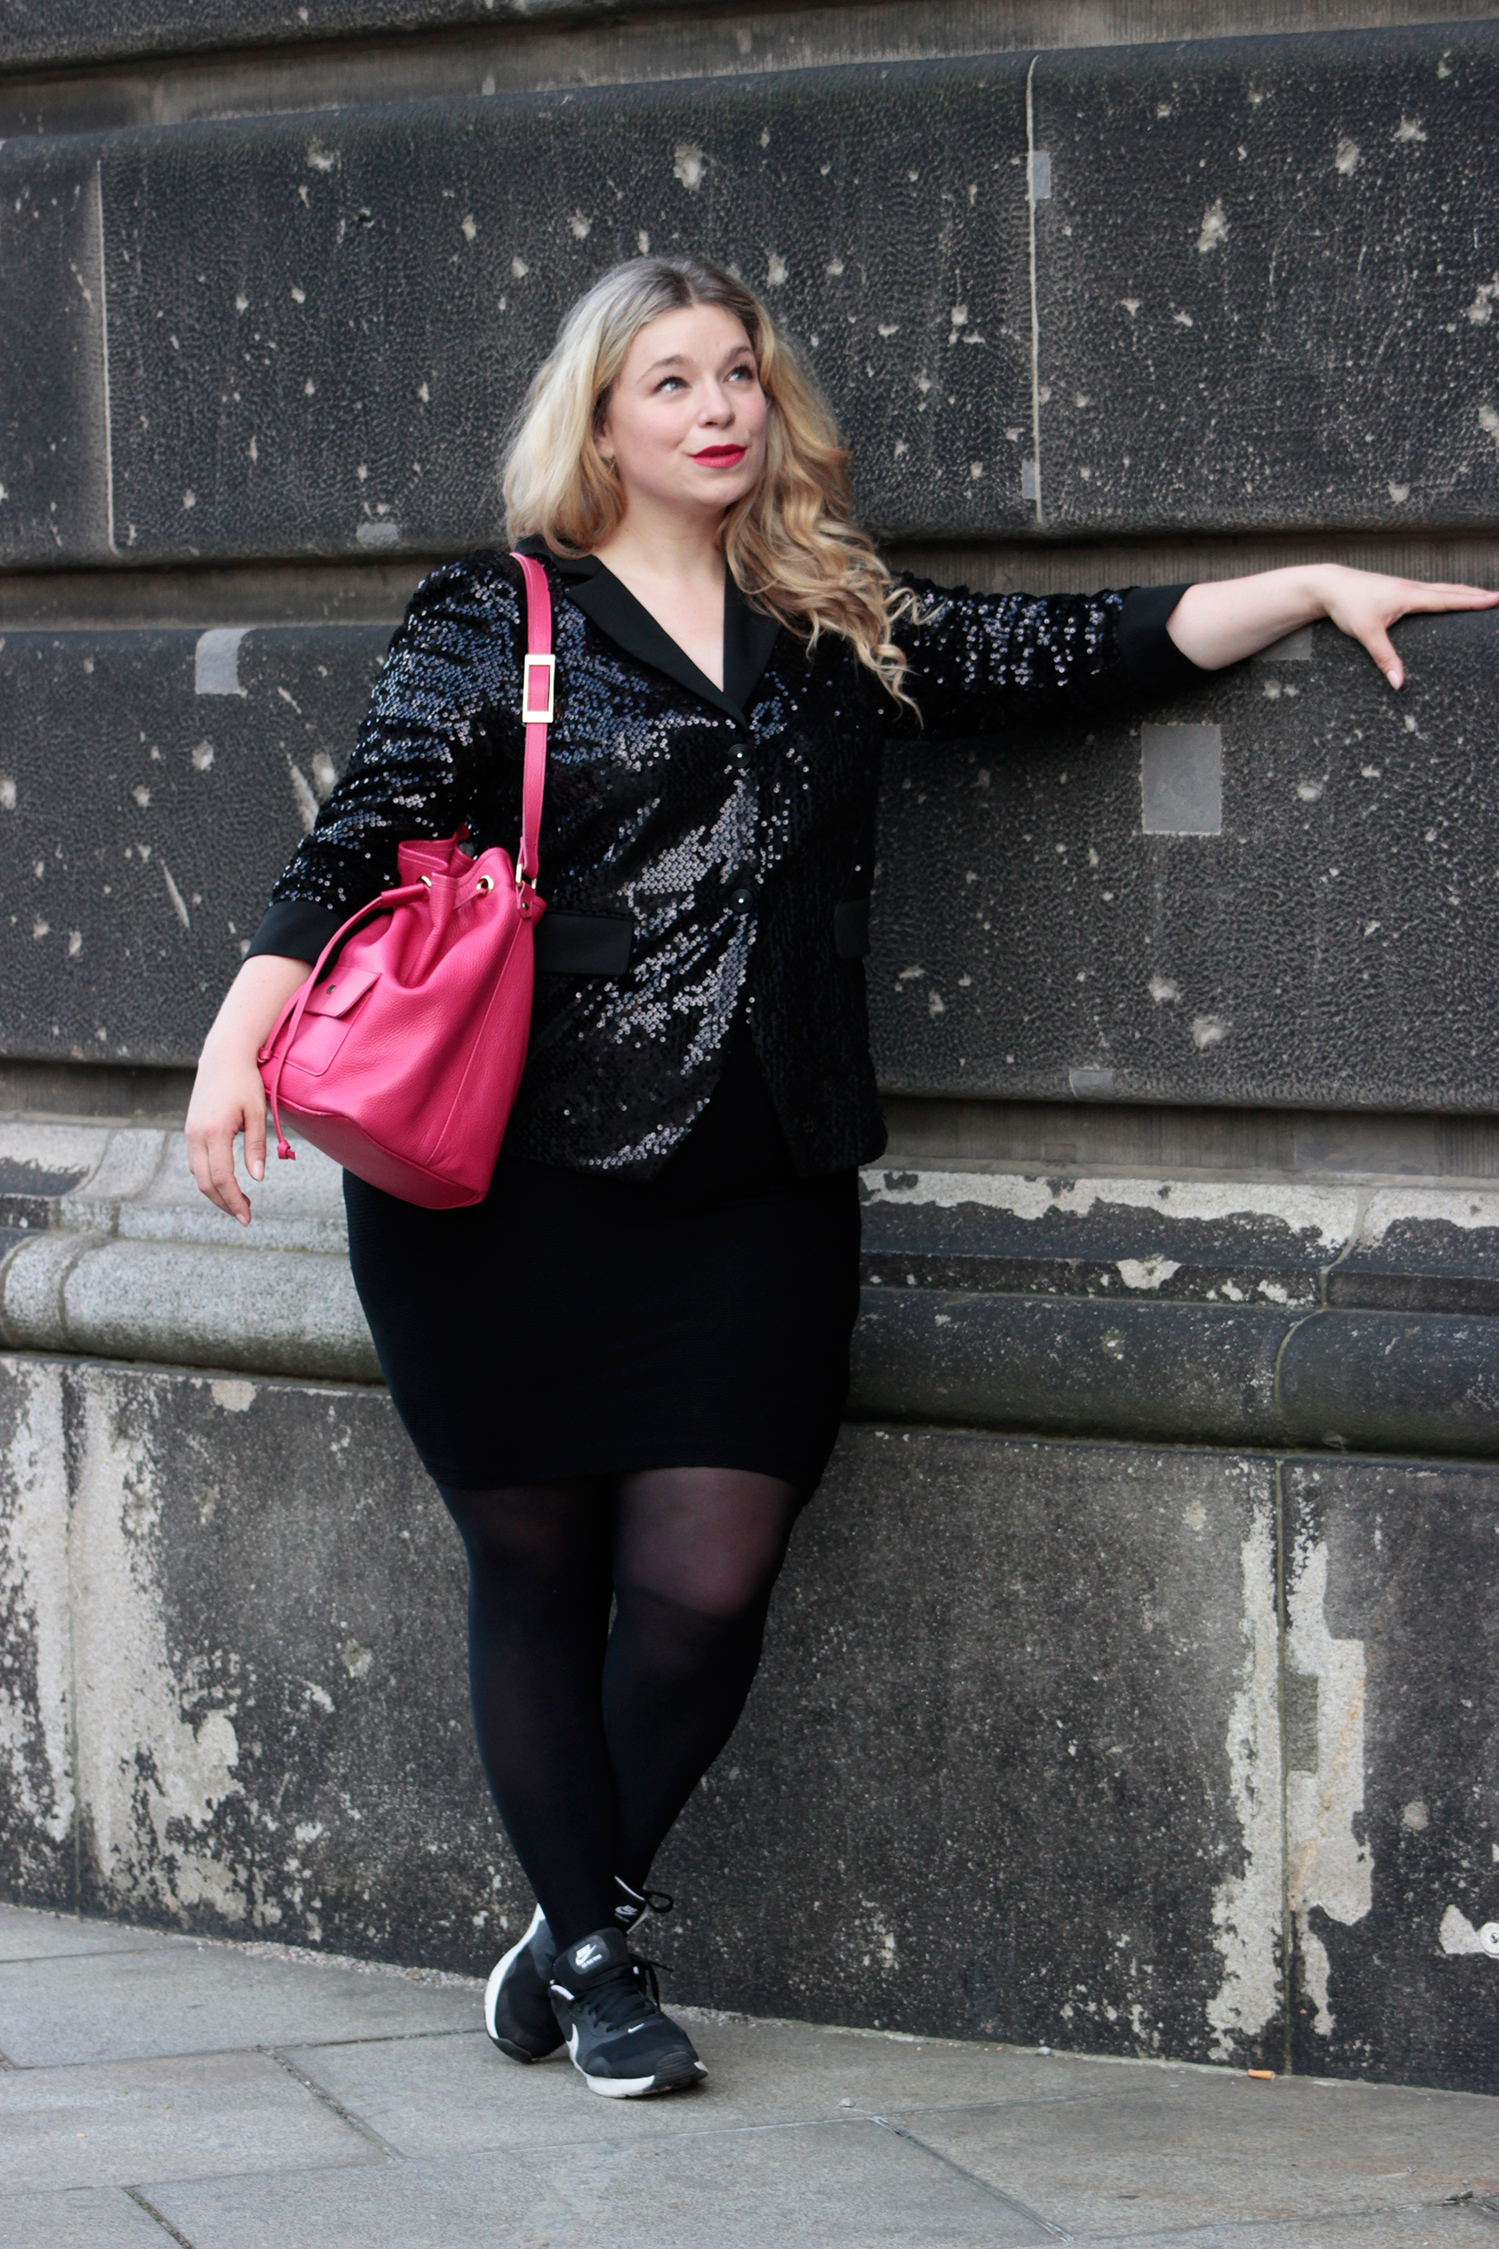 Pailetten-Blazer-plussizeblogger-Megabambi-fashionblog-caterina-pogorzelski-curvymodel